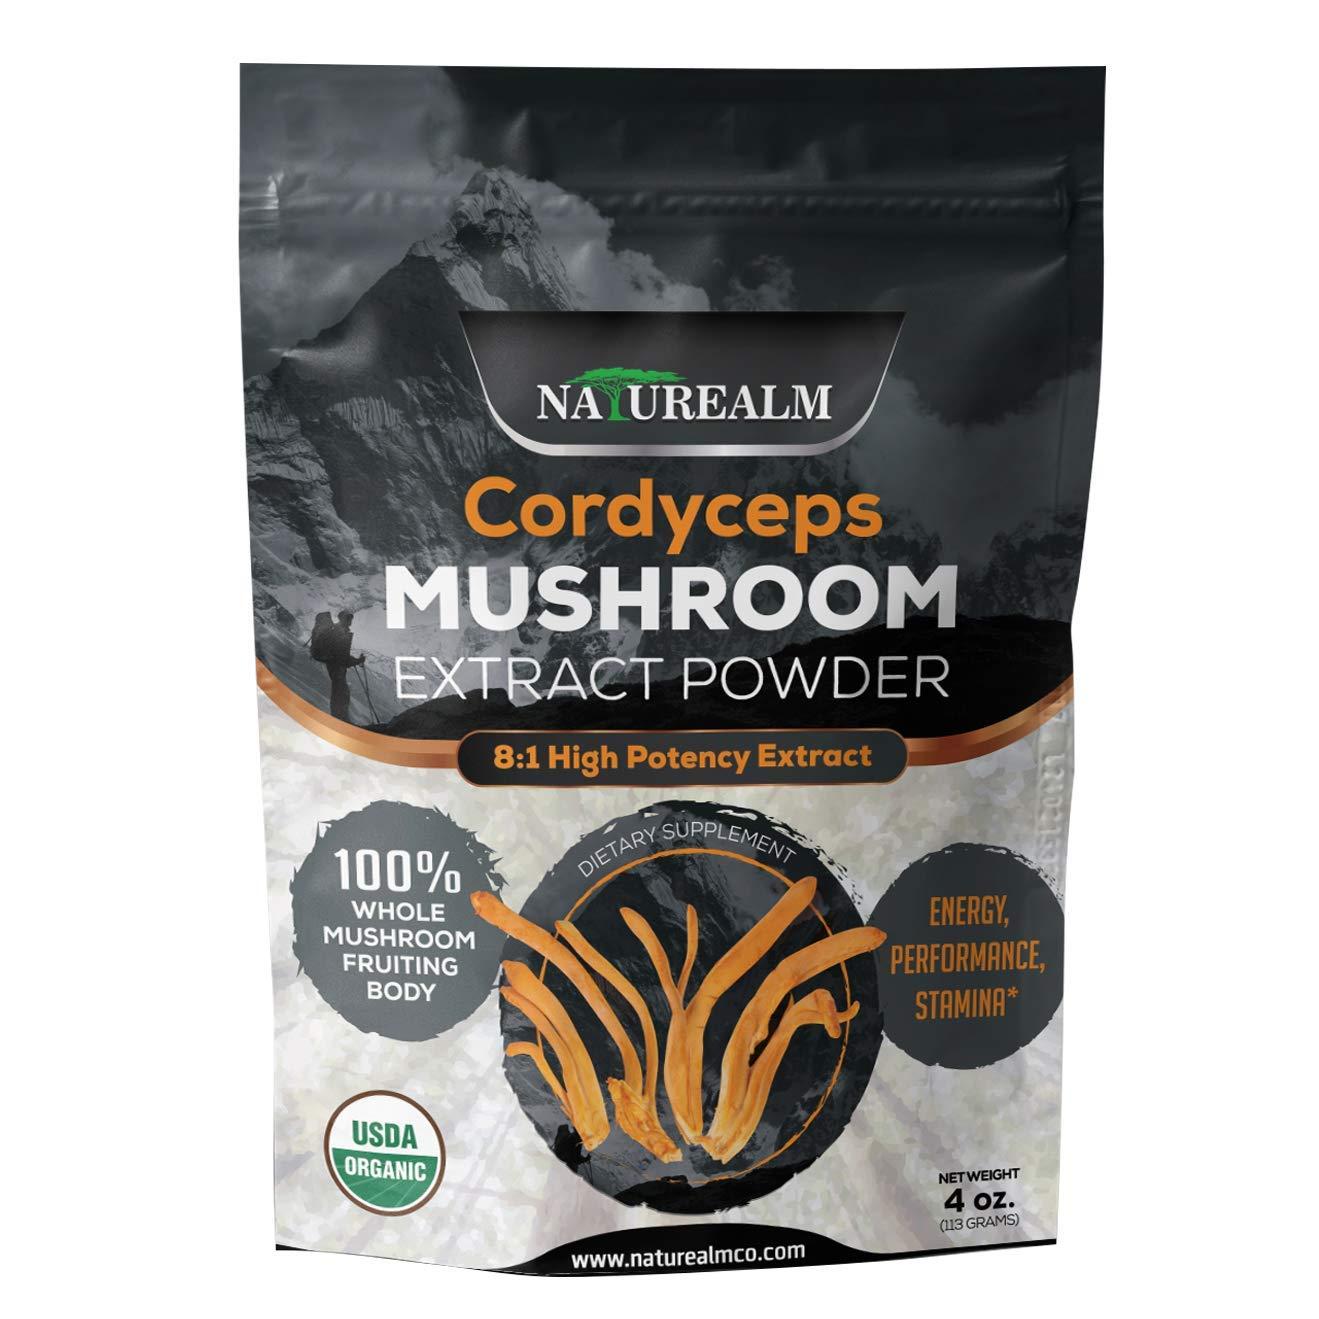 Cordyceps Mushroom 8 1 Extract Powder – USDA Certified Organic – High Performance Energy Supplement – Stamina, Endurance, Oxygen Utilization – Whole Mushrooms No Fillers – 4oz 113g